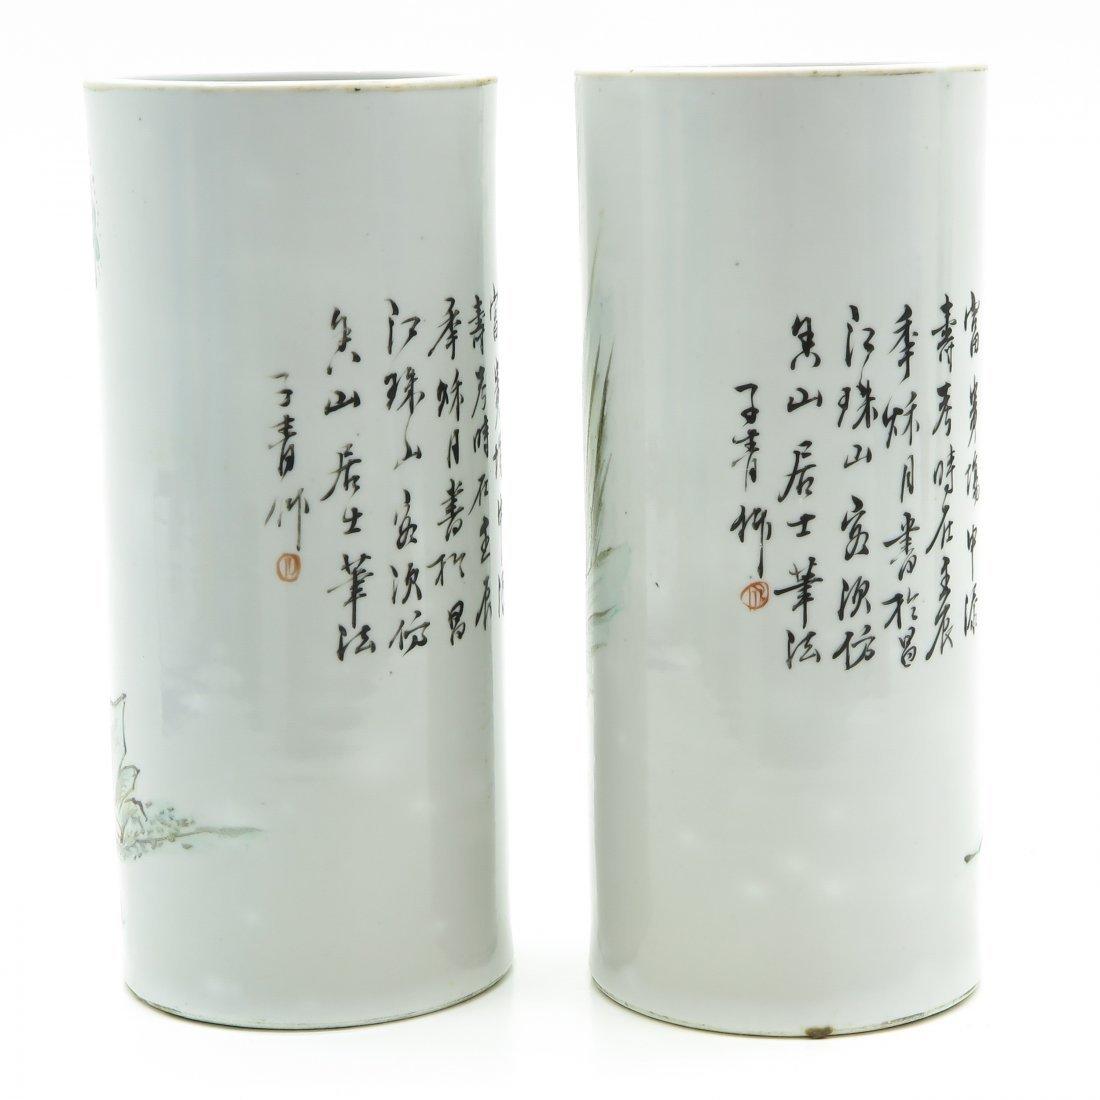 Lot of 2 China Porcelain Cylinder Roll Wagon Vases - 3